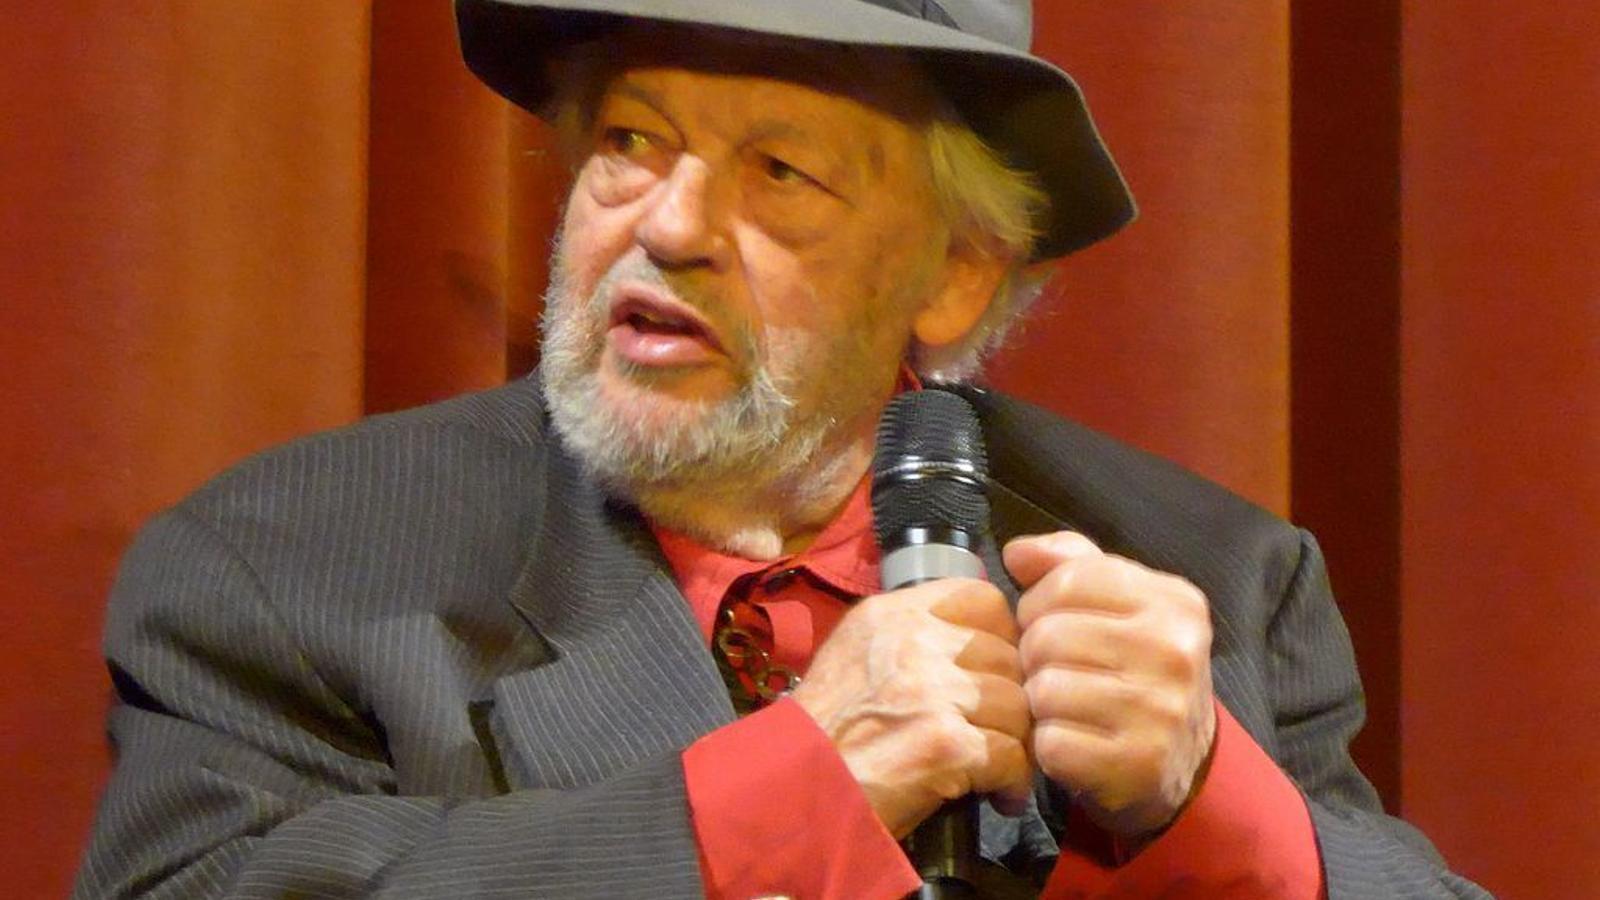 Peter Berling